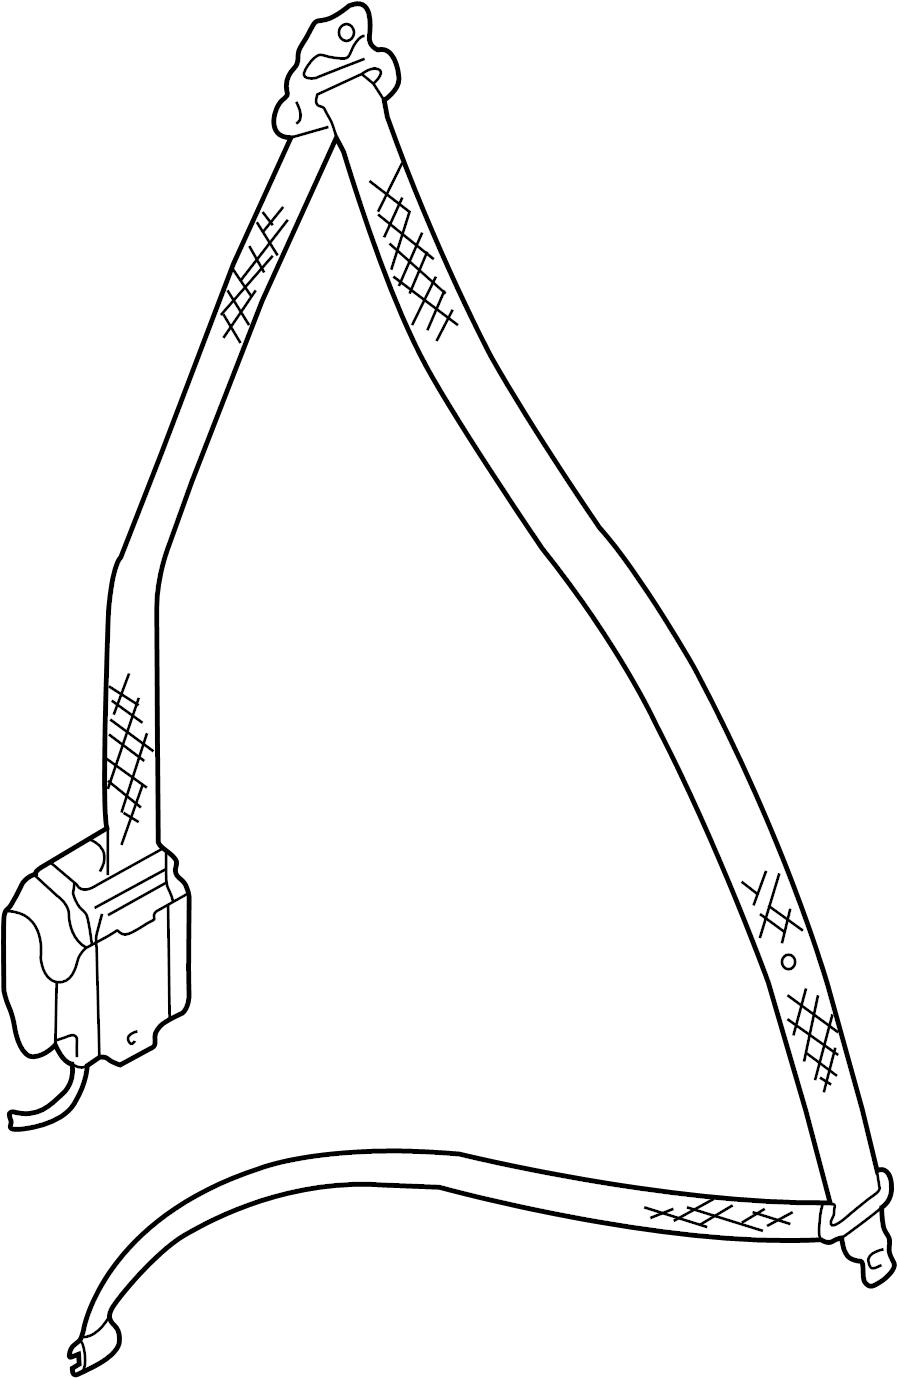 2002 volkswagen cabrio seat belt shoulder belt  front